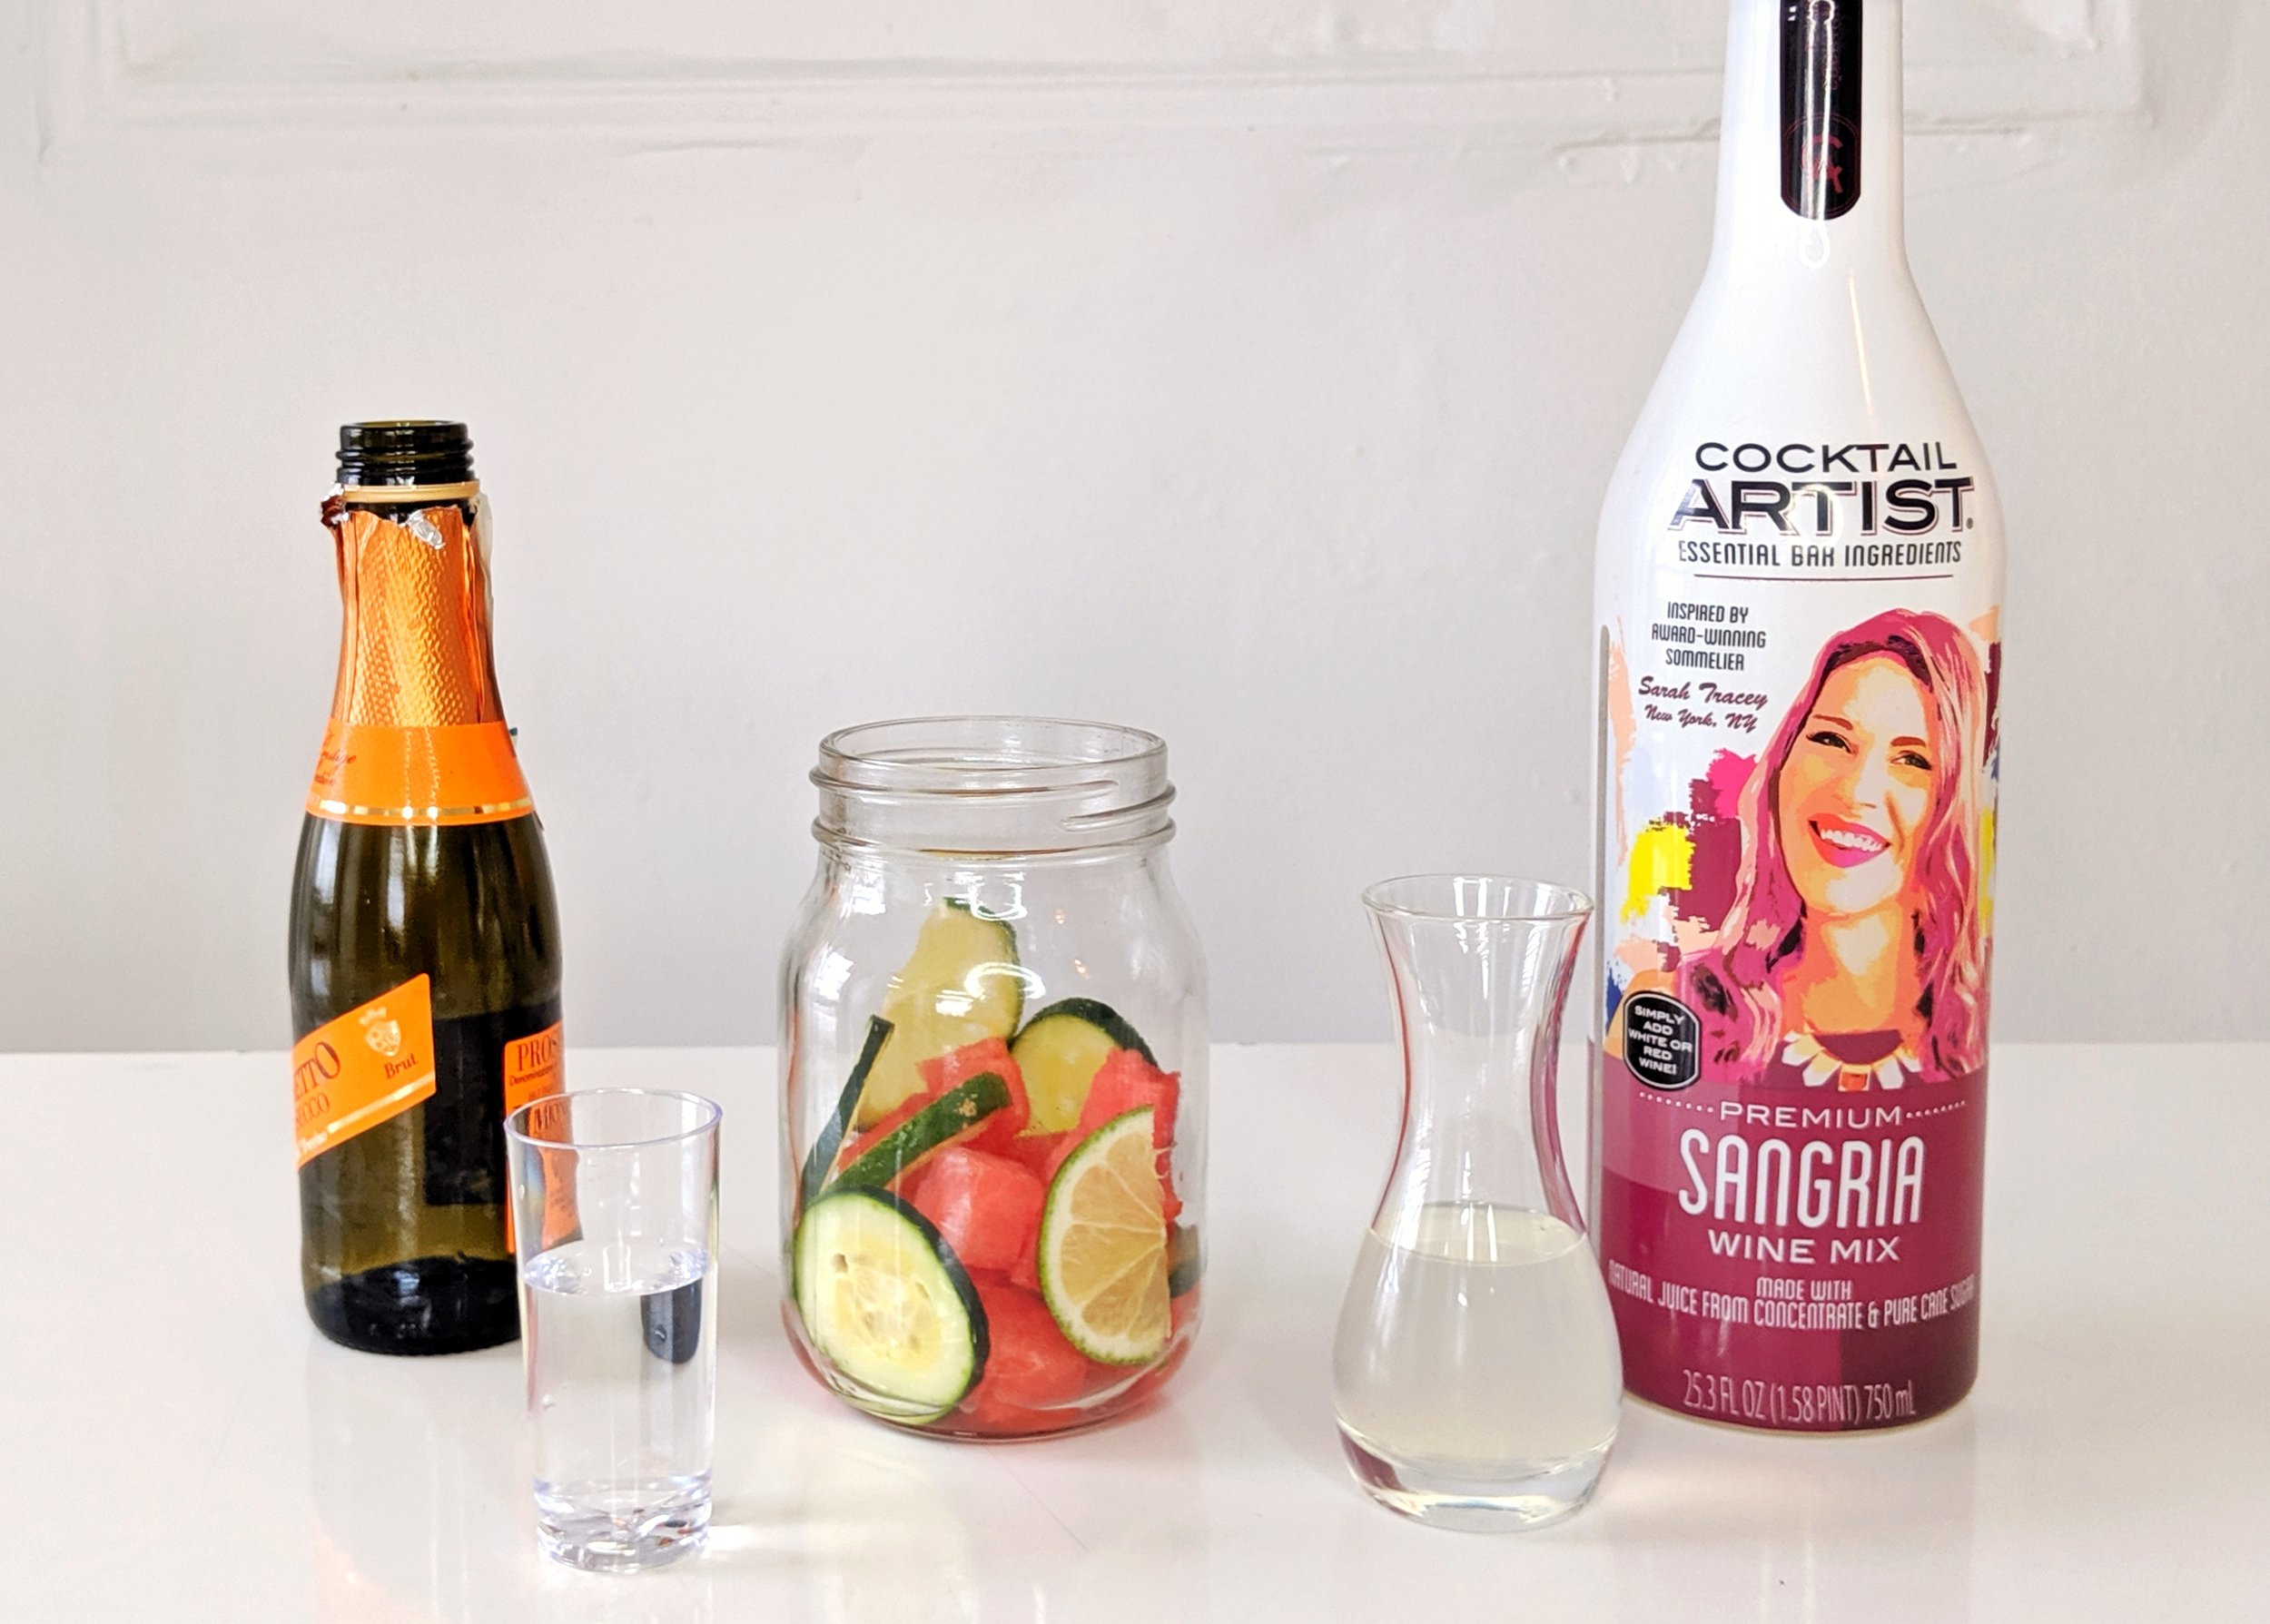 Cocktail Artist Premium Sangria Wine Mix makes a perfect Cucumber Watermelon Sparkling Sangria